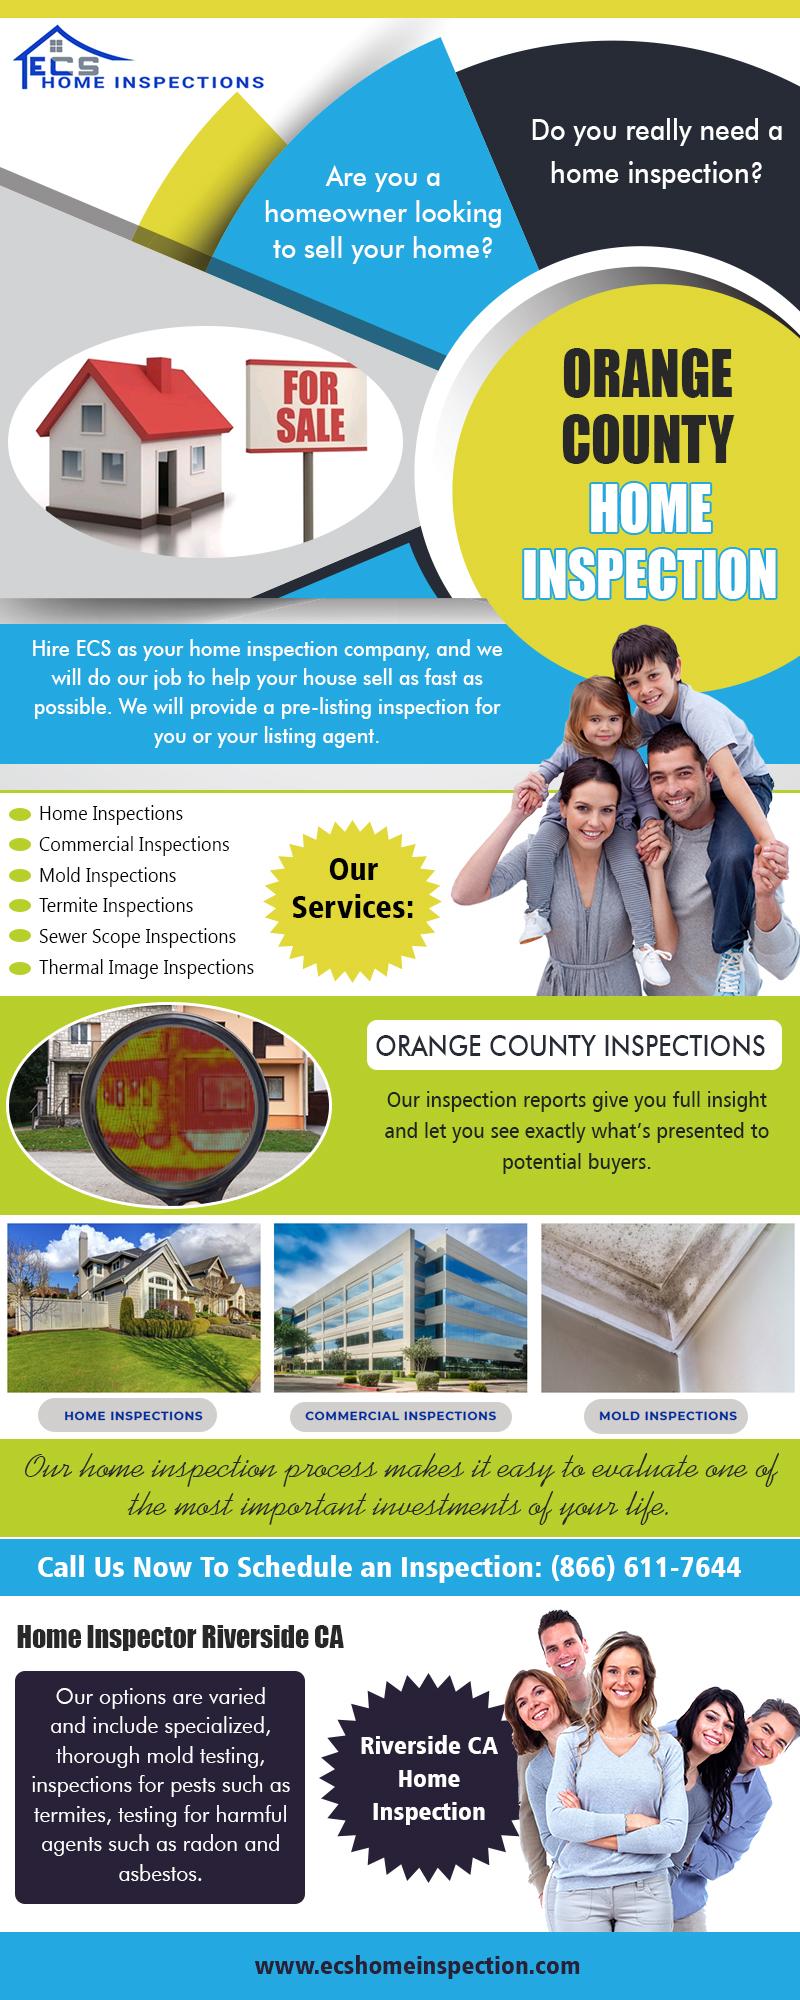 Orange County Home Inspection